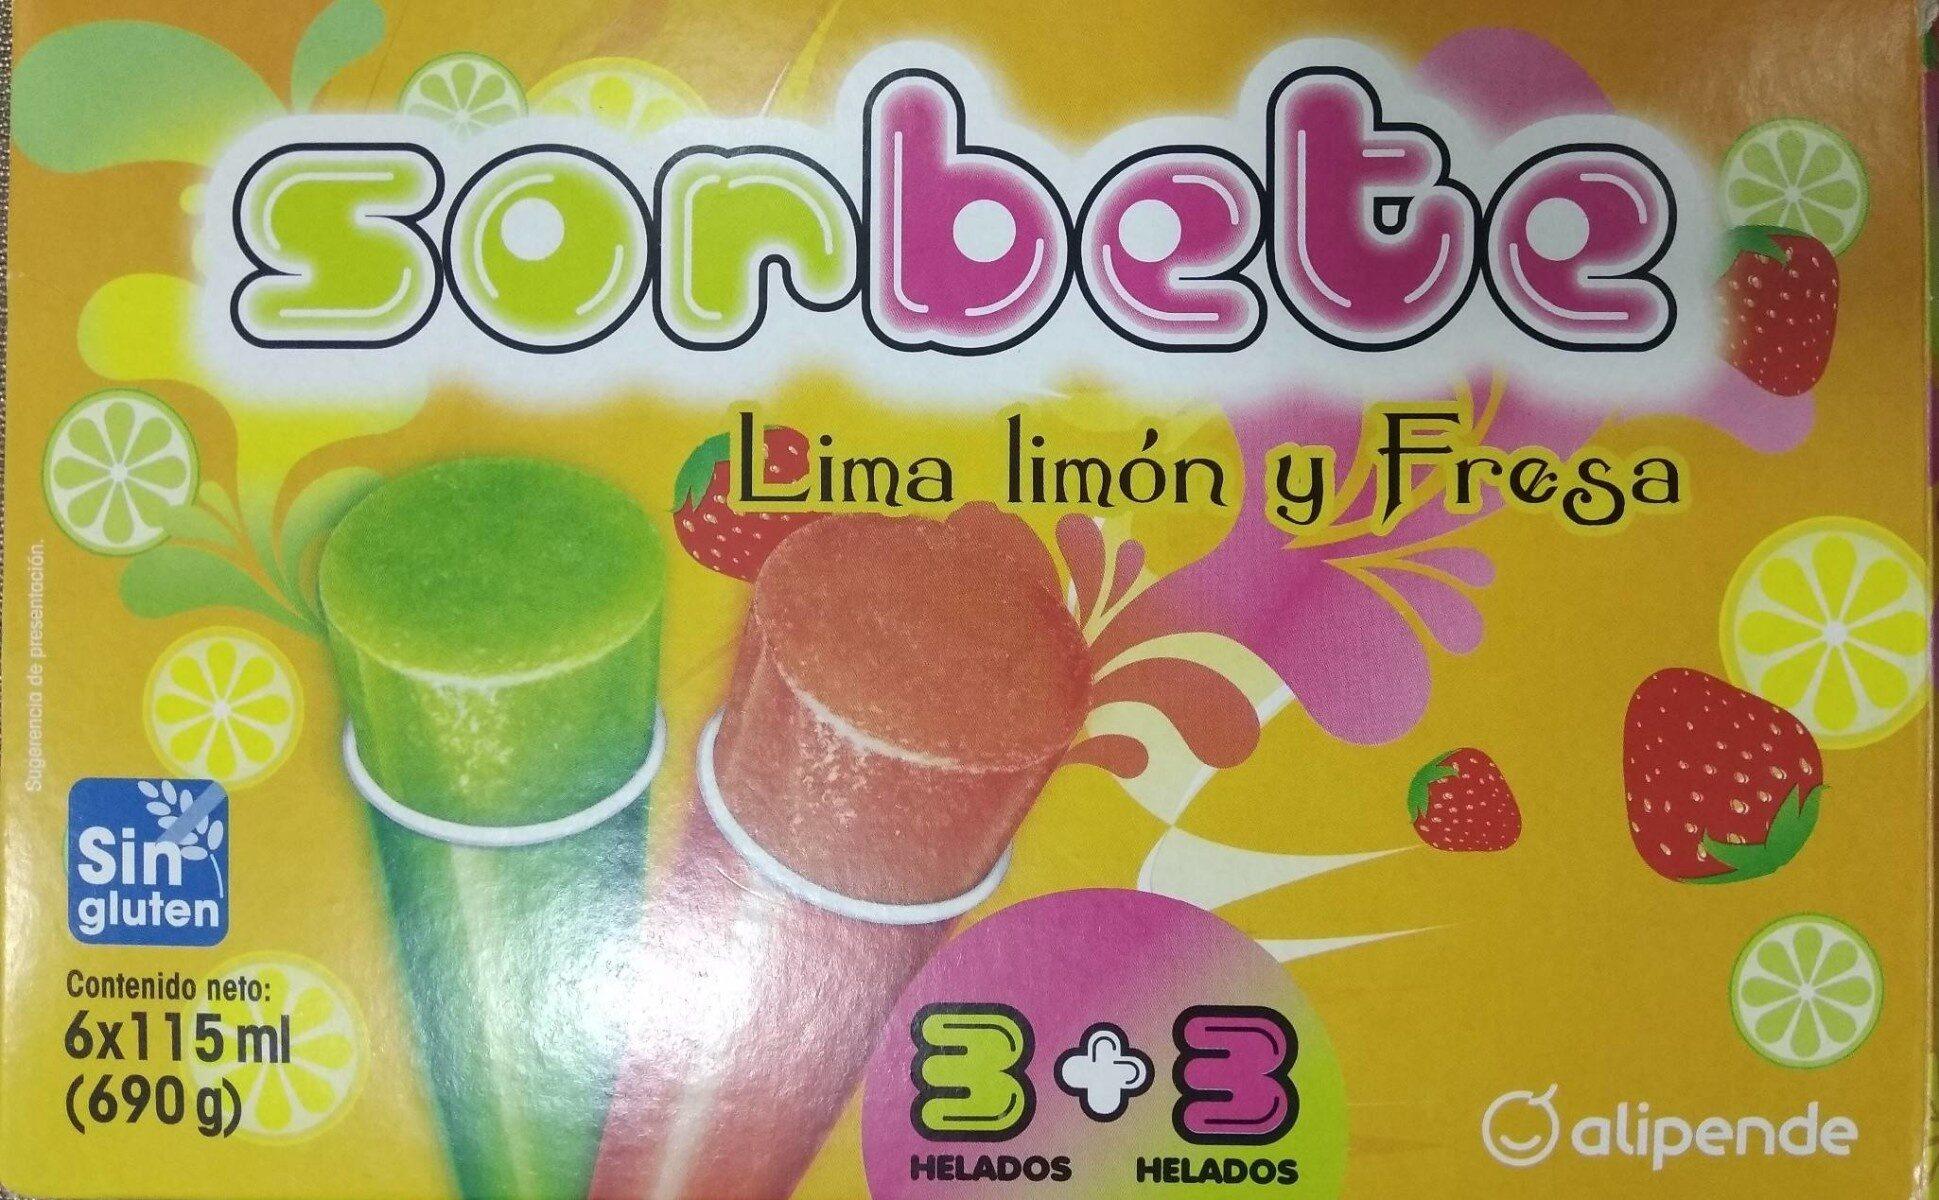 Sorbete Lima limón y Fresa - Produit - es